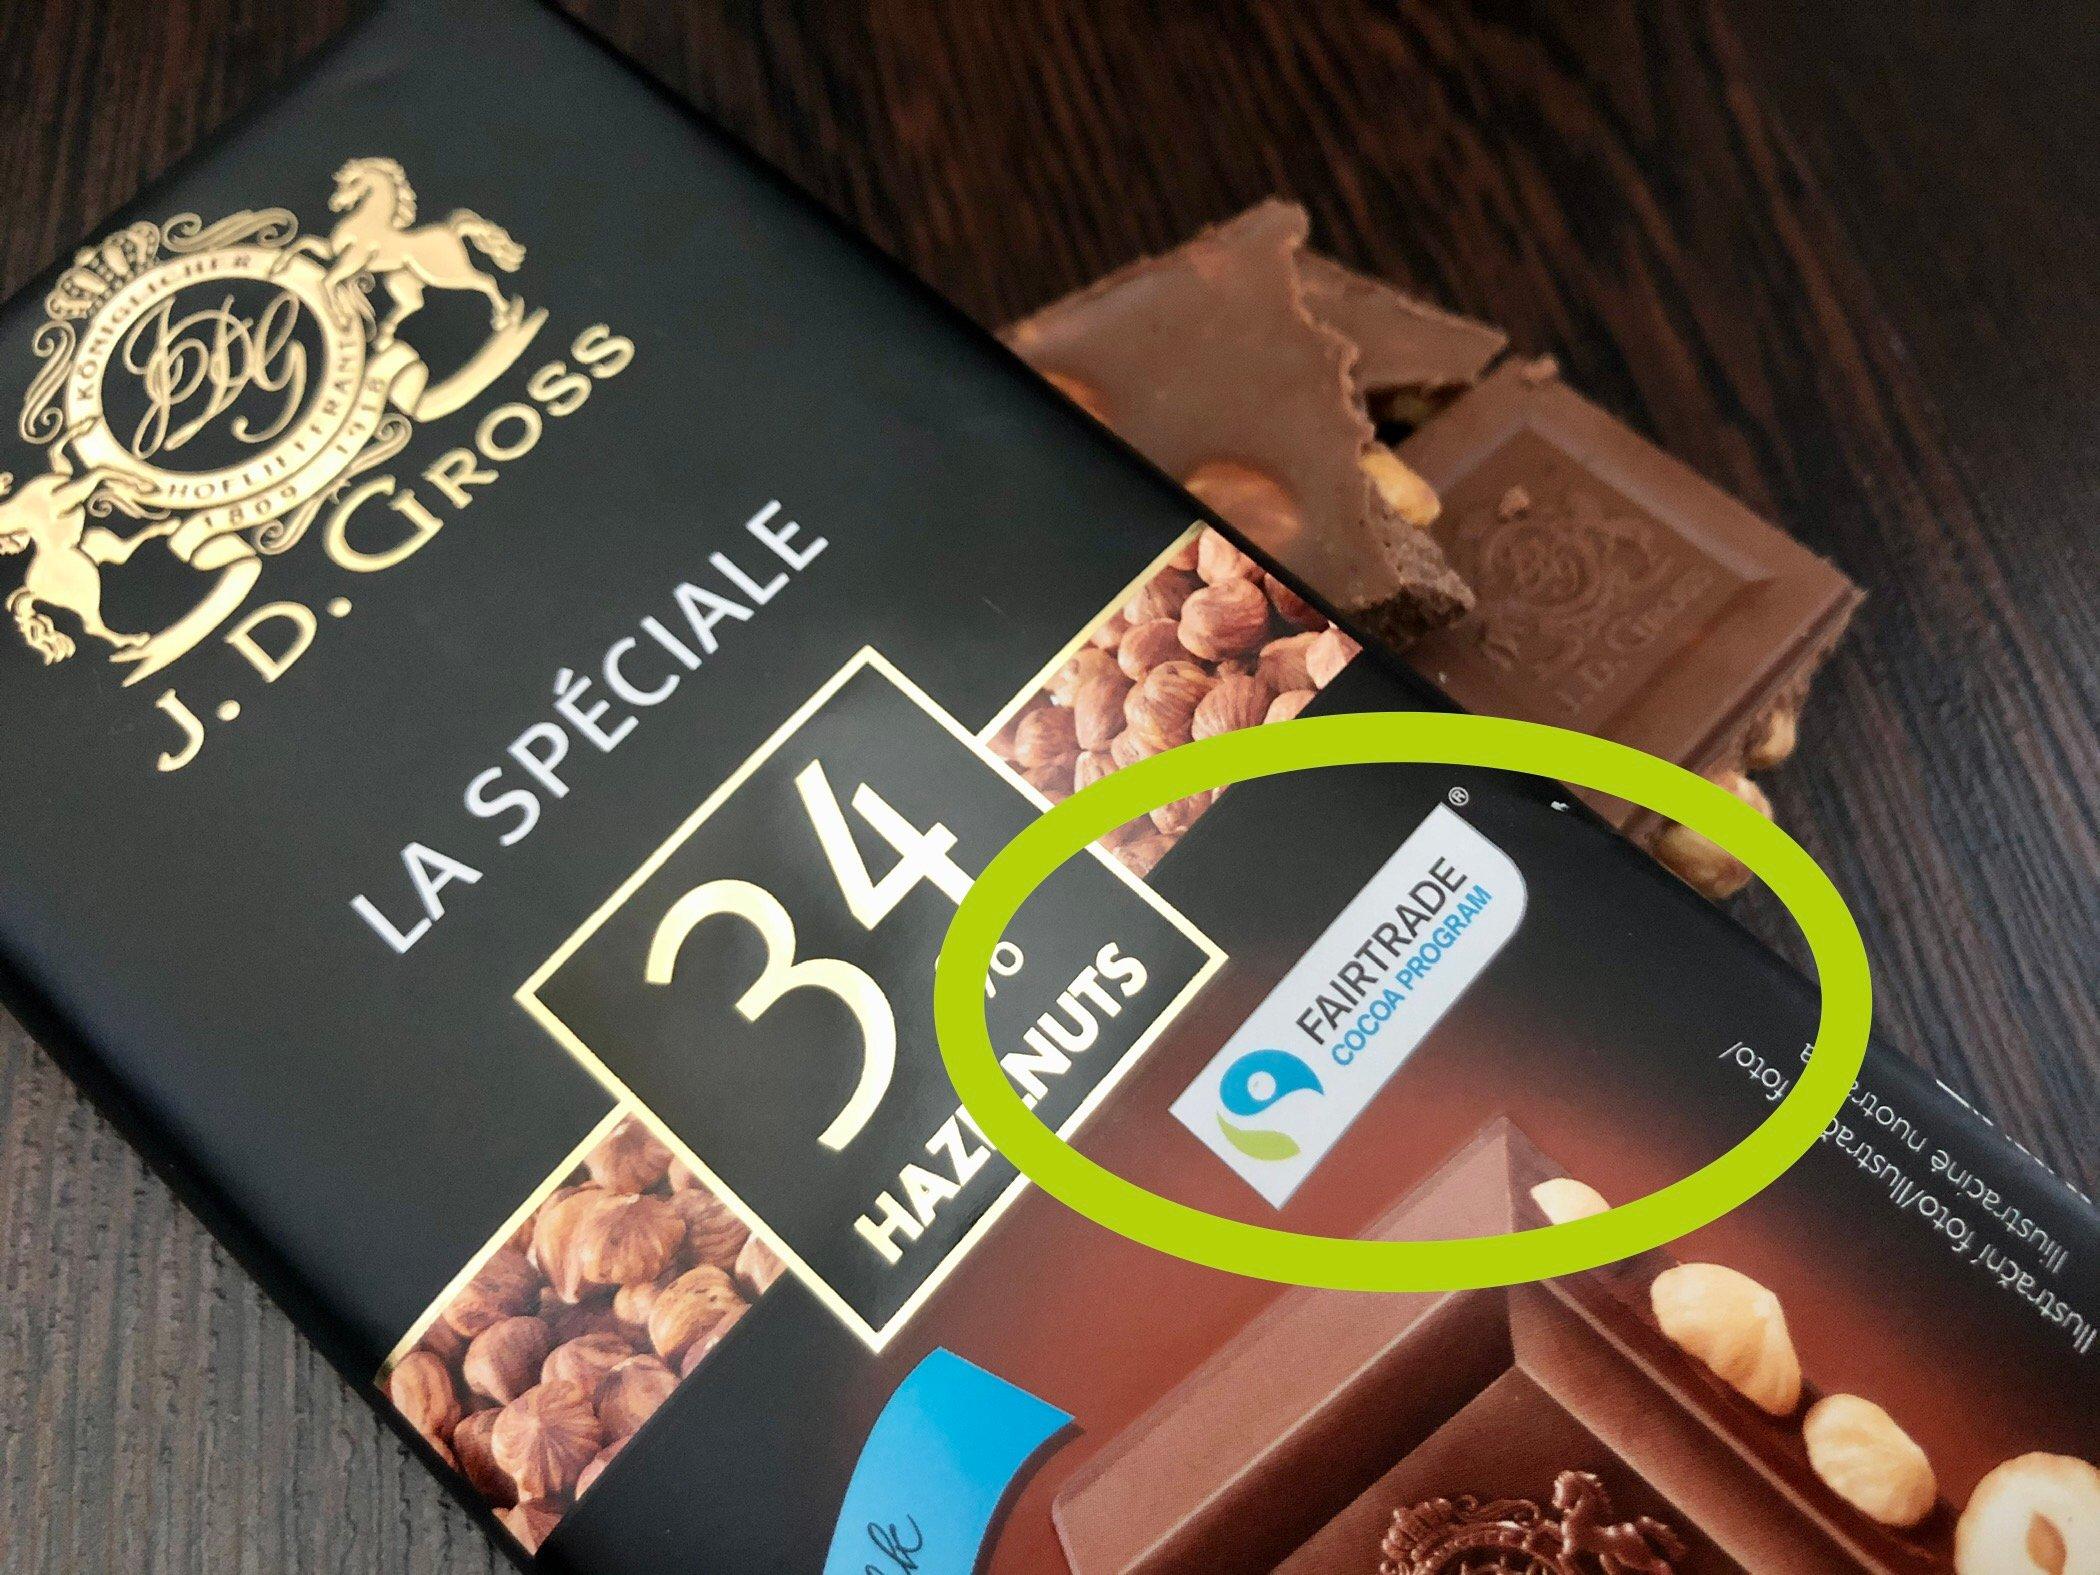 Lidl Fairtrade.